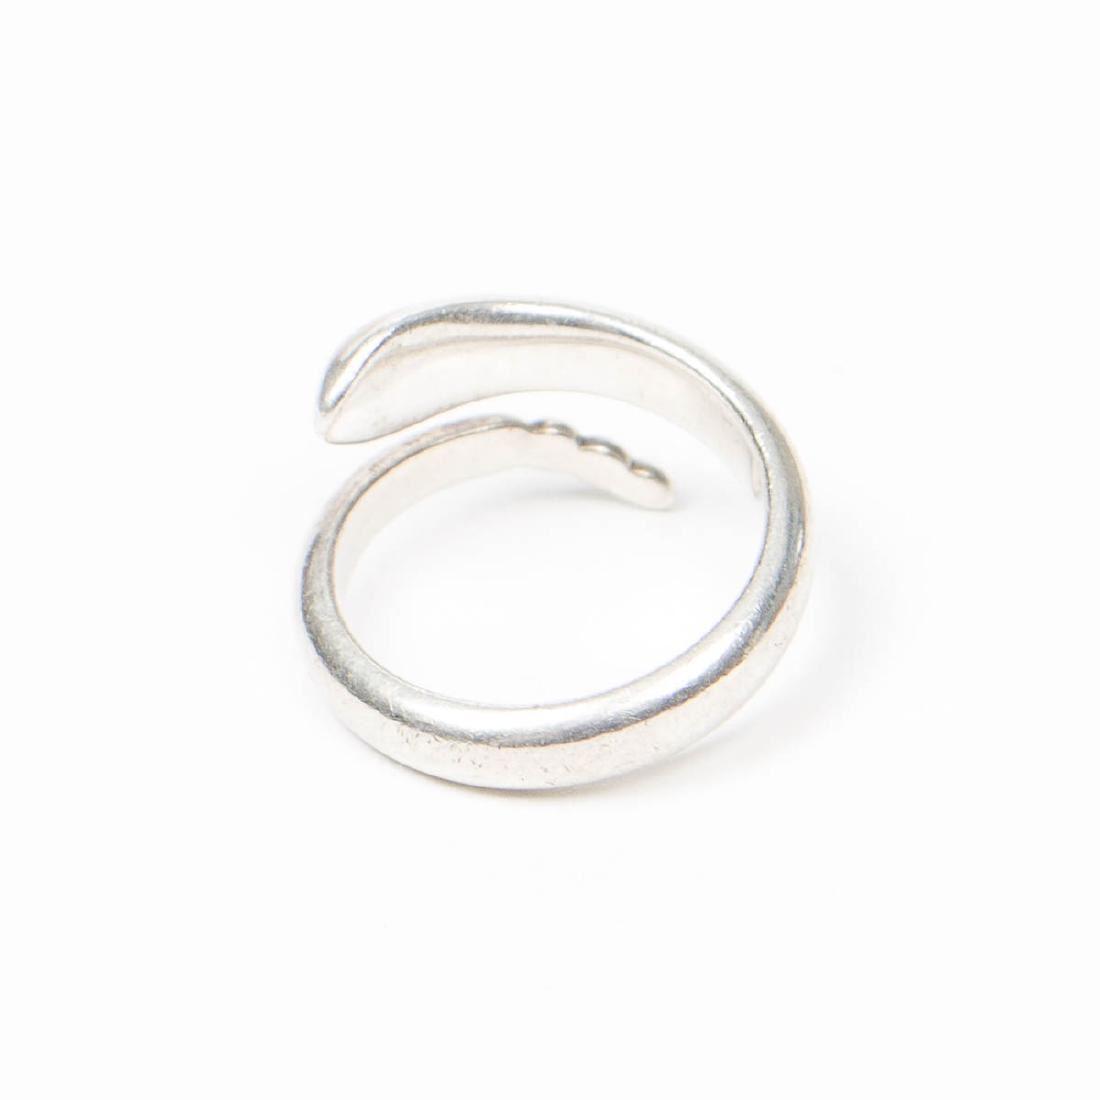 6b79ed16c Image 1 : Tiffany Elsa Peretti Snake Ring 49